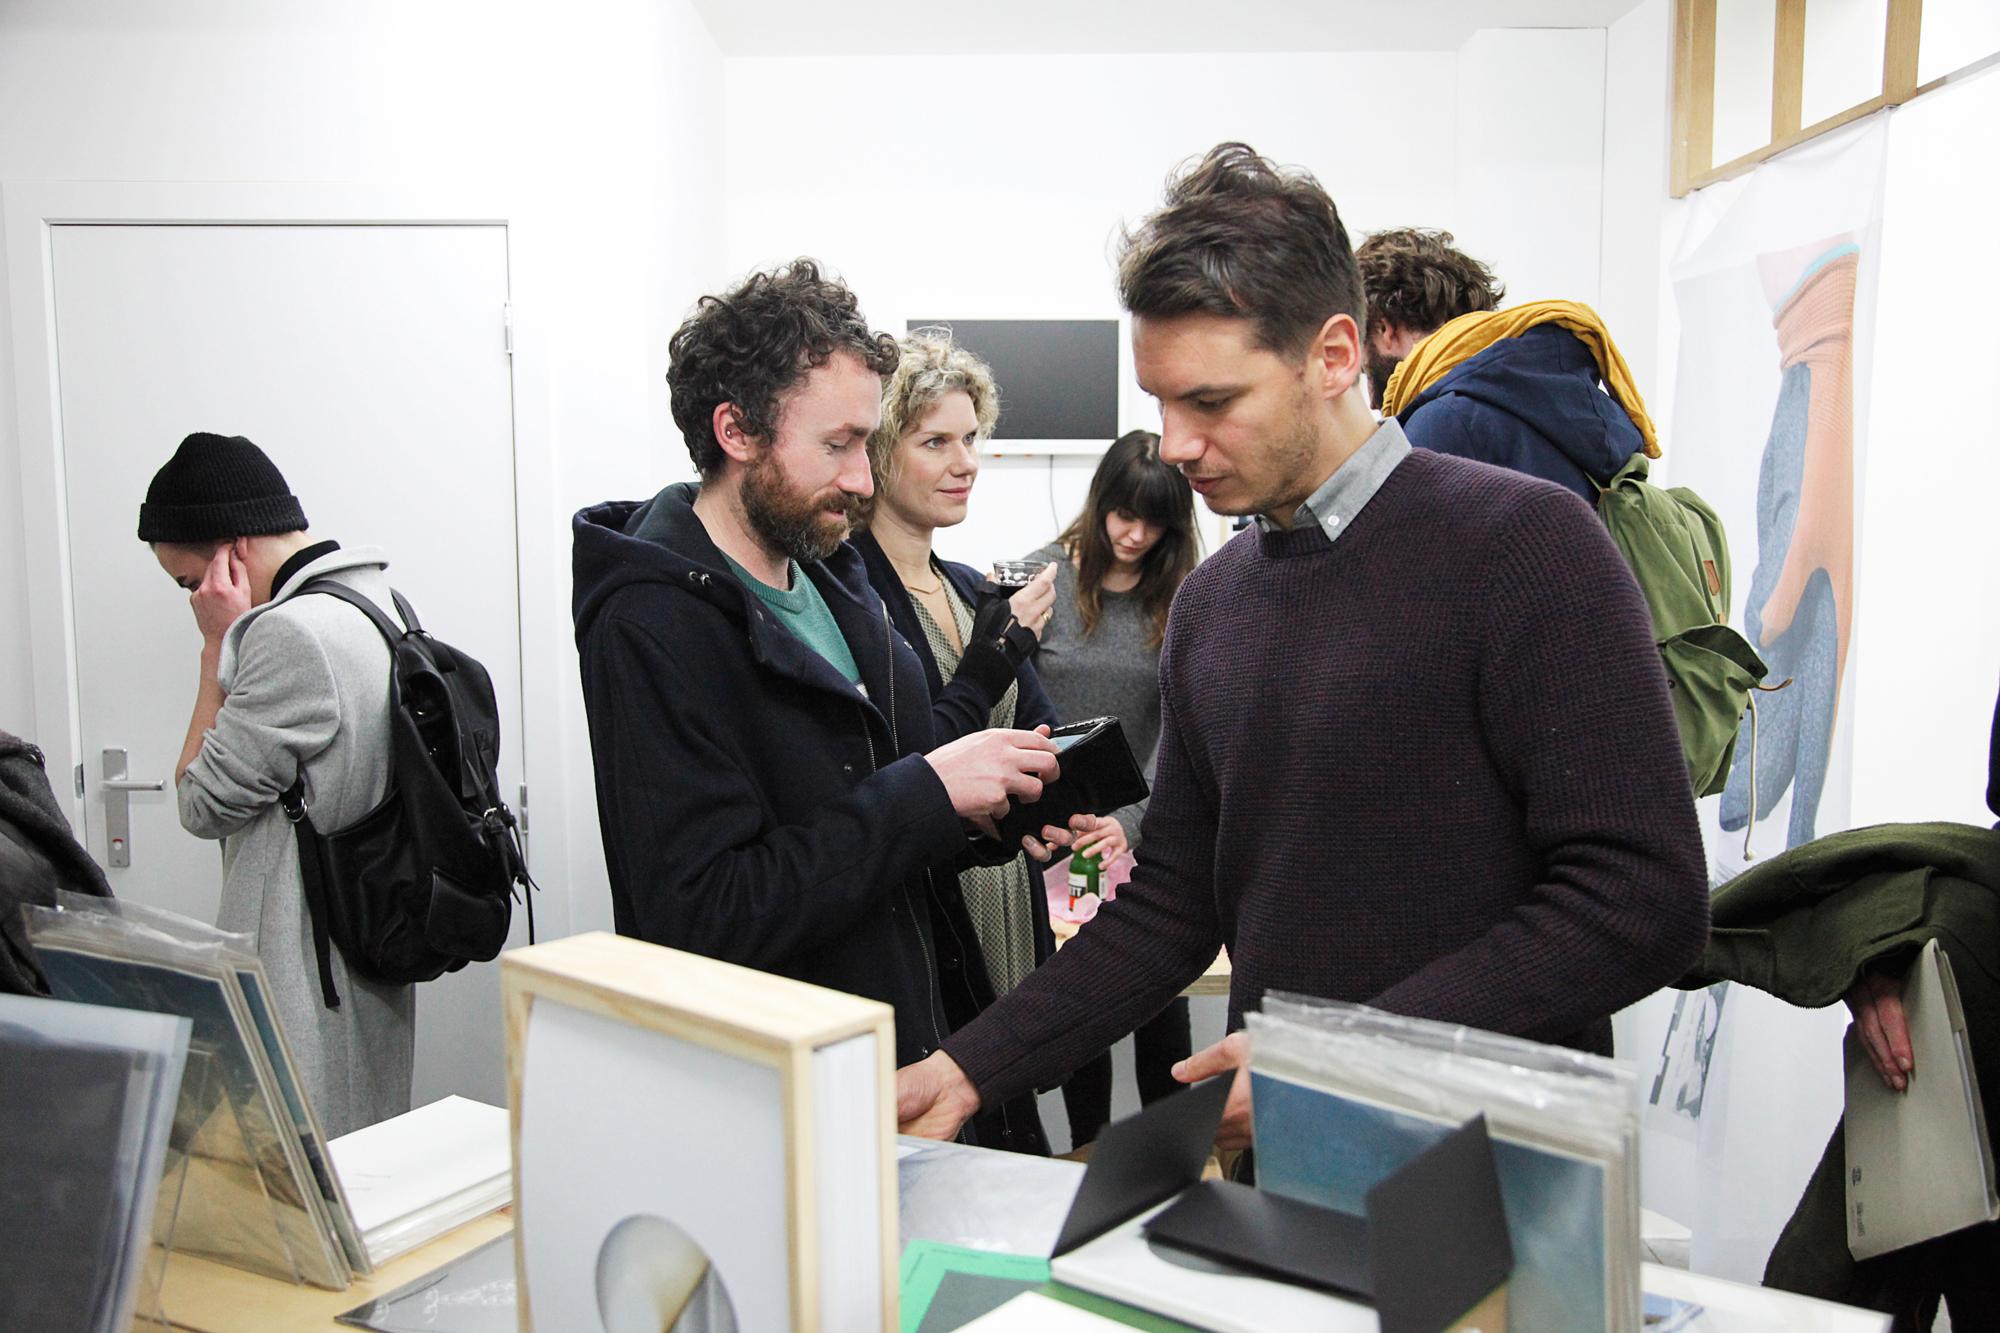 Tique Salon - Nick Geboers, Celine van den Boorn, Ward Heirwegh